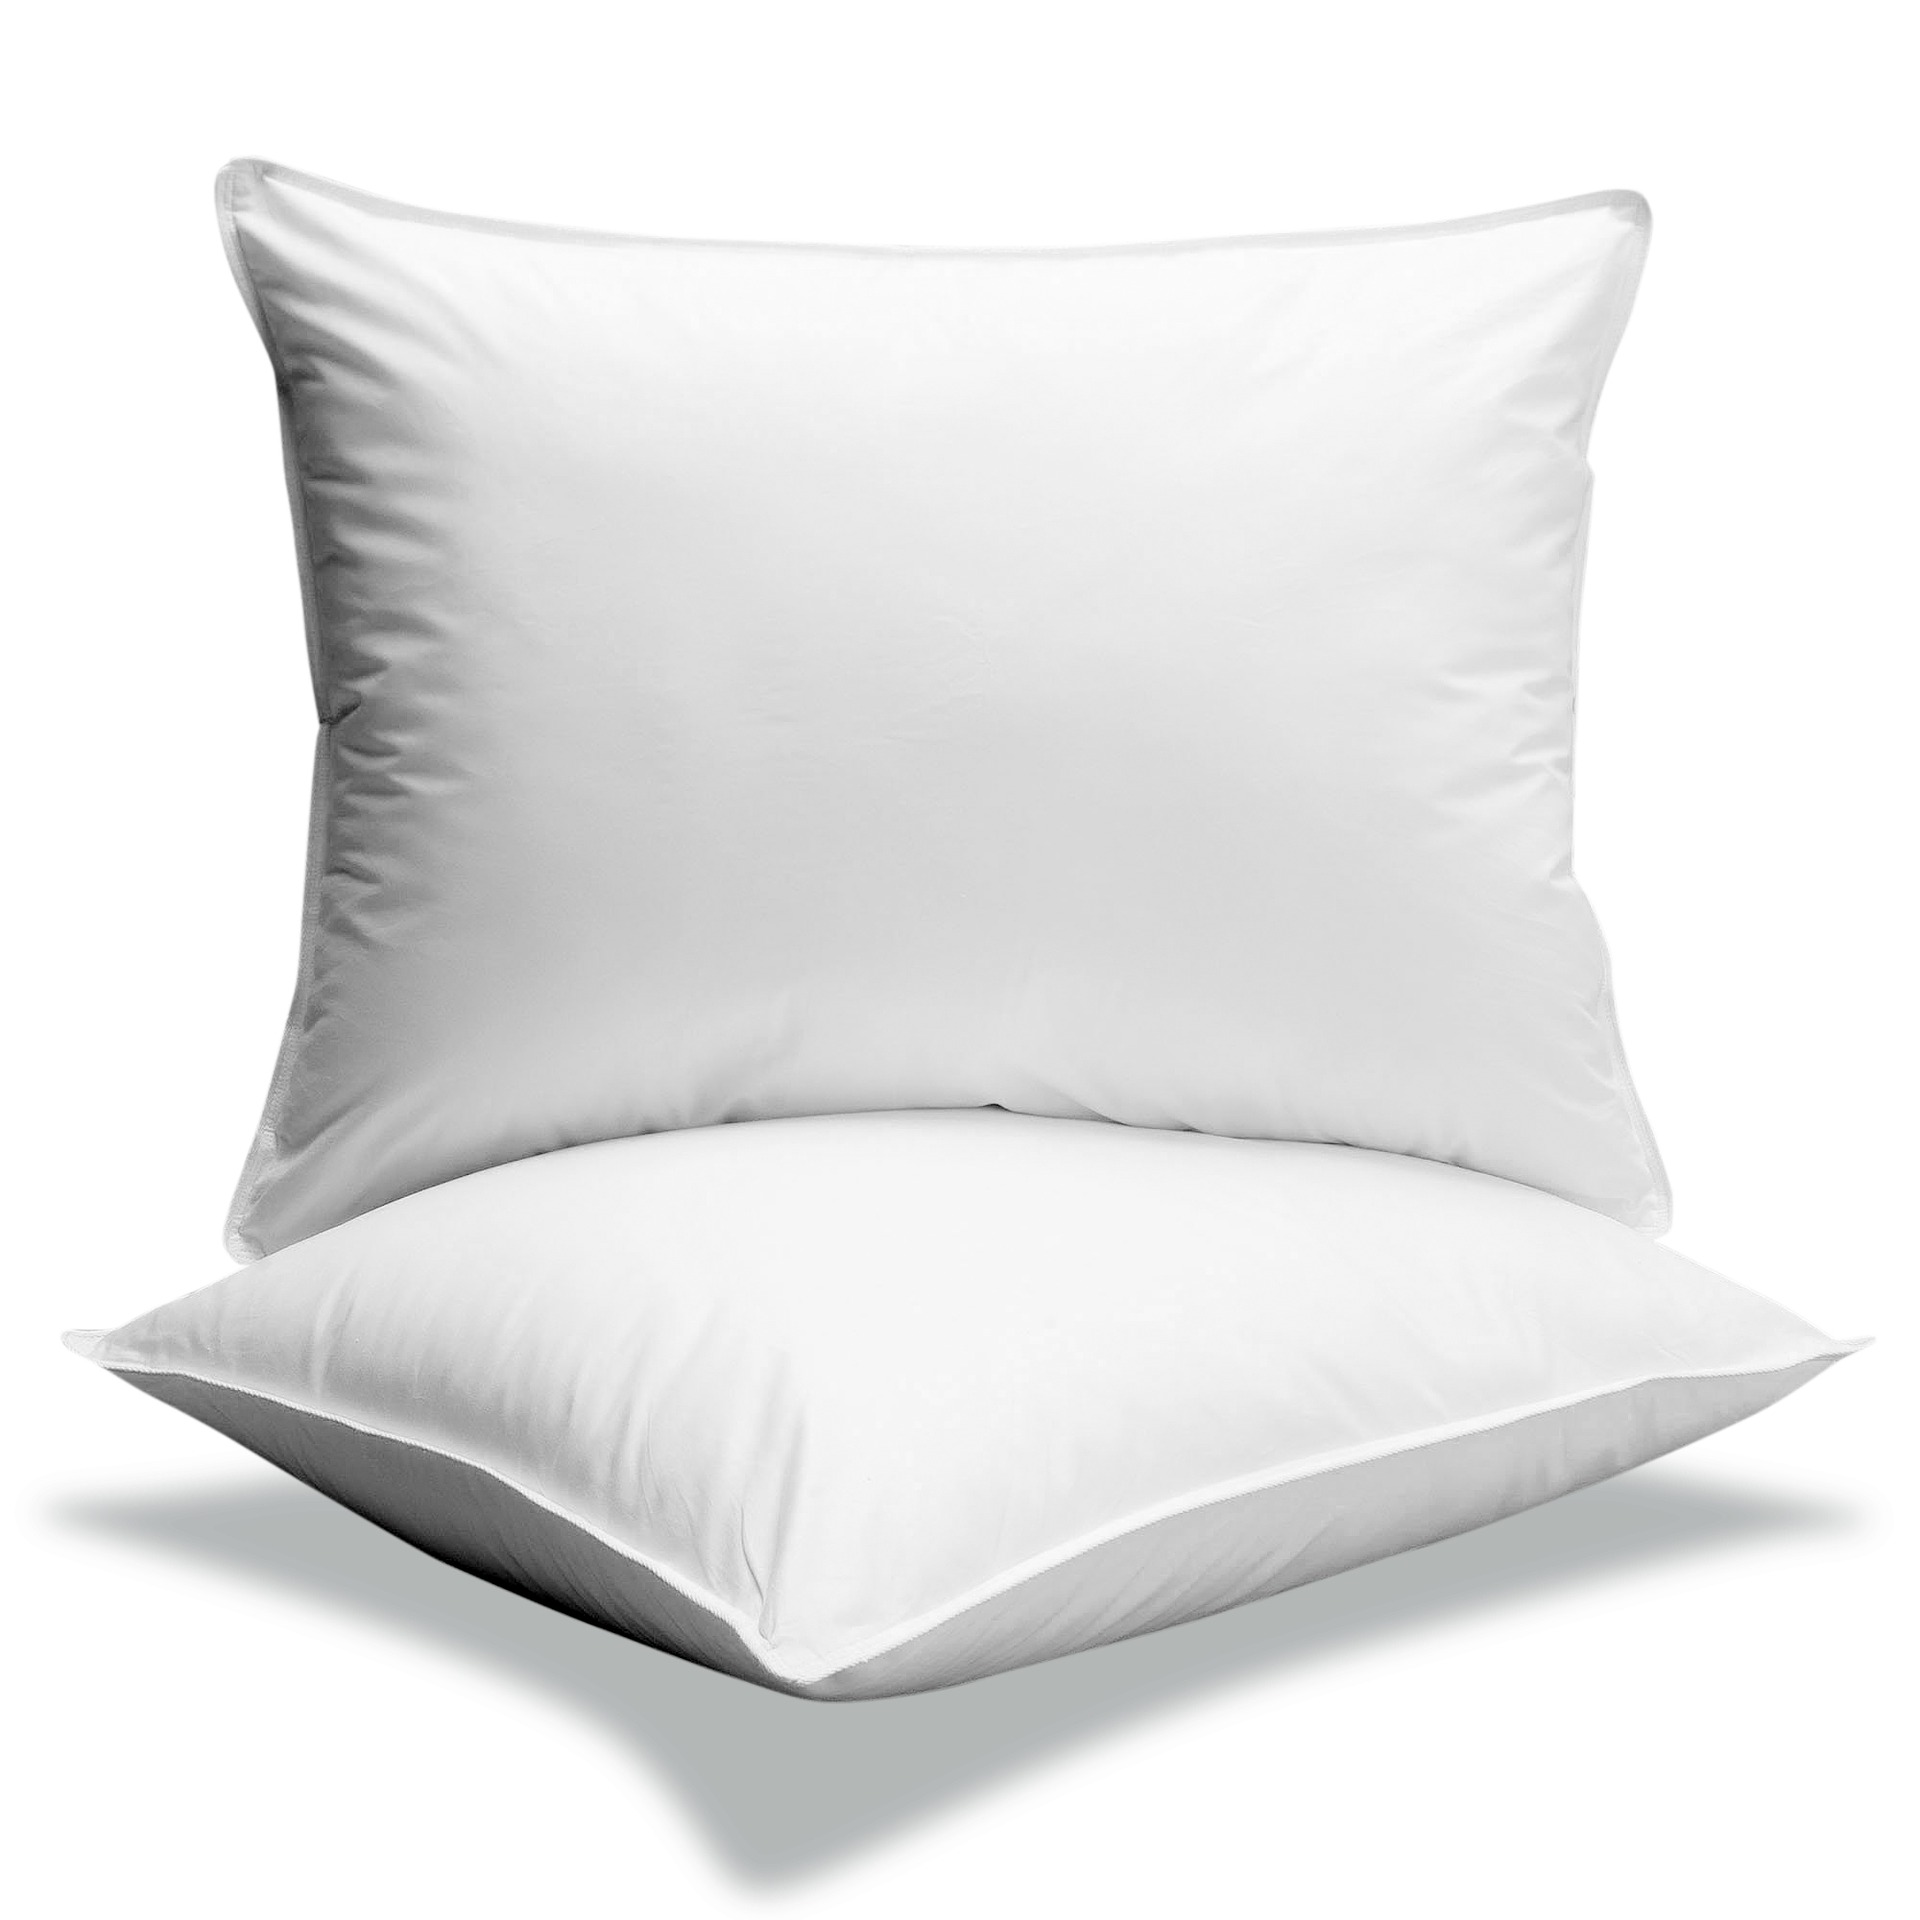 pillow-1738023_1920